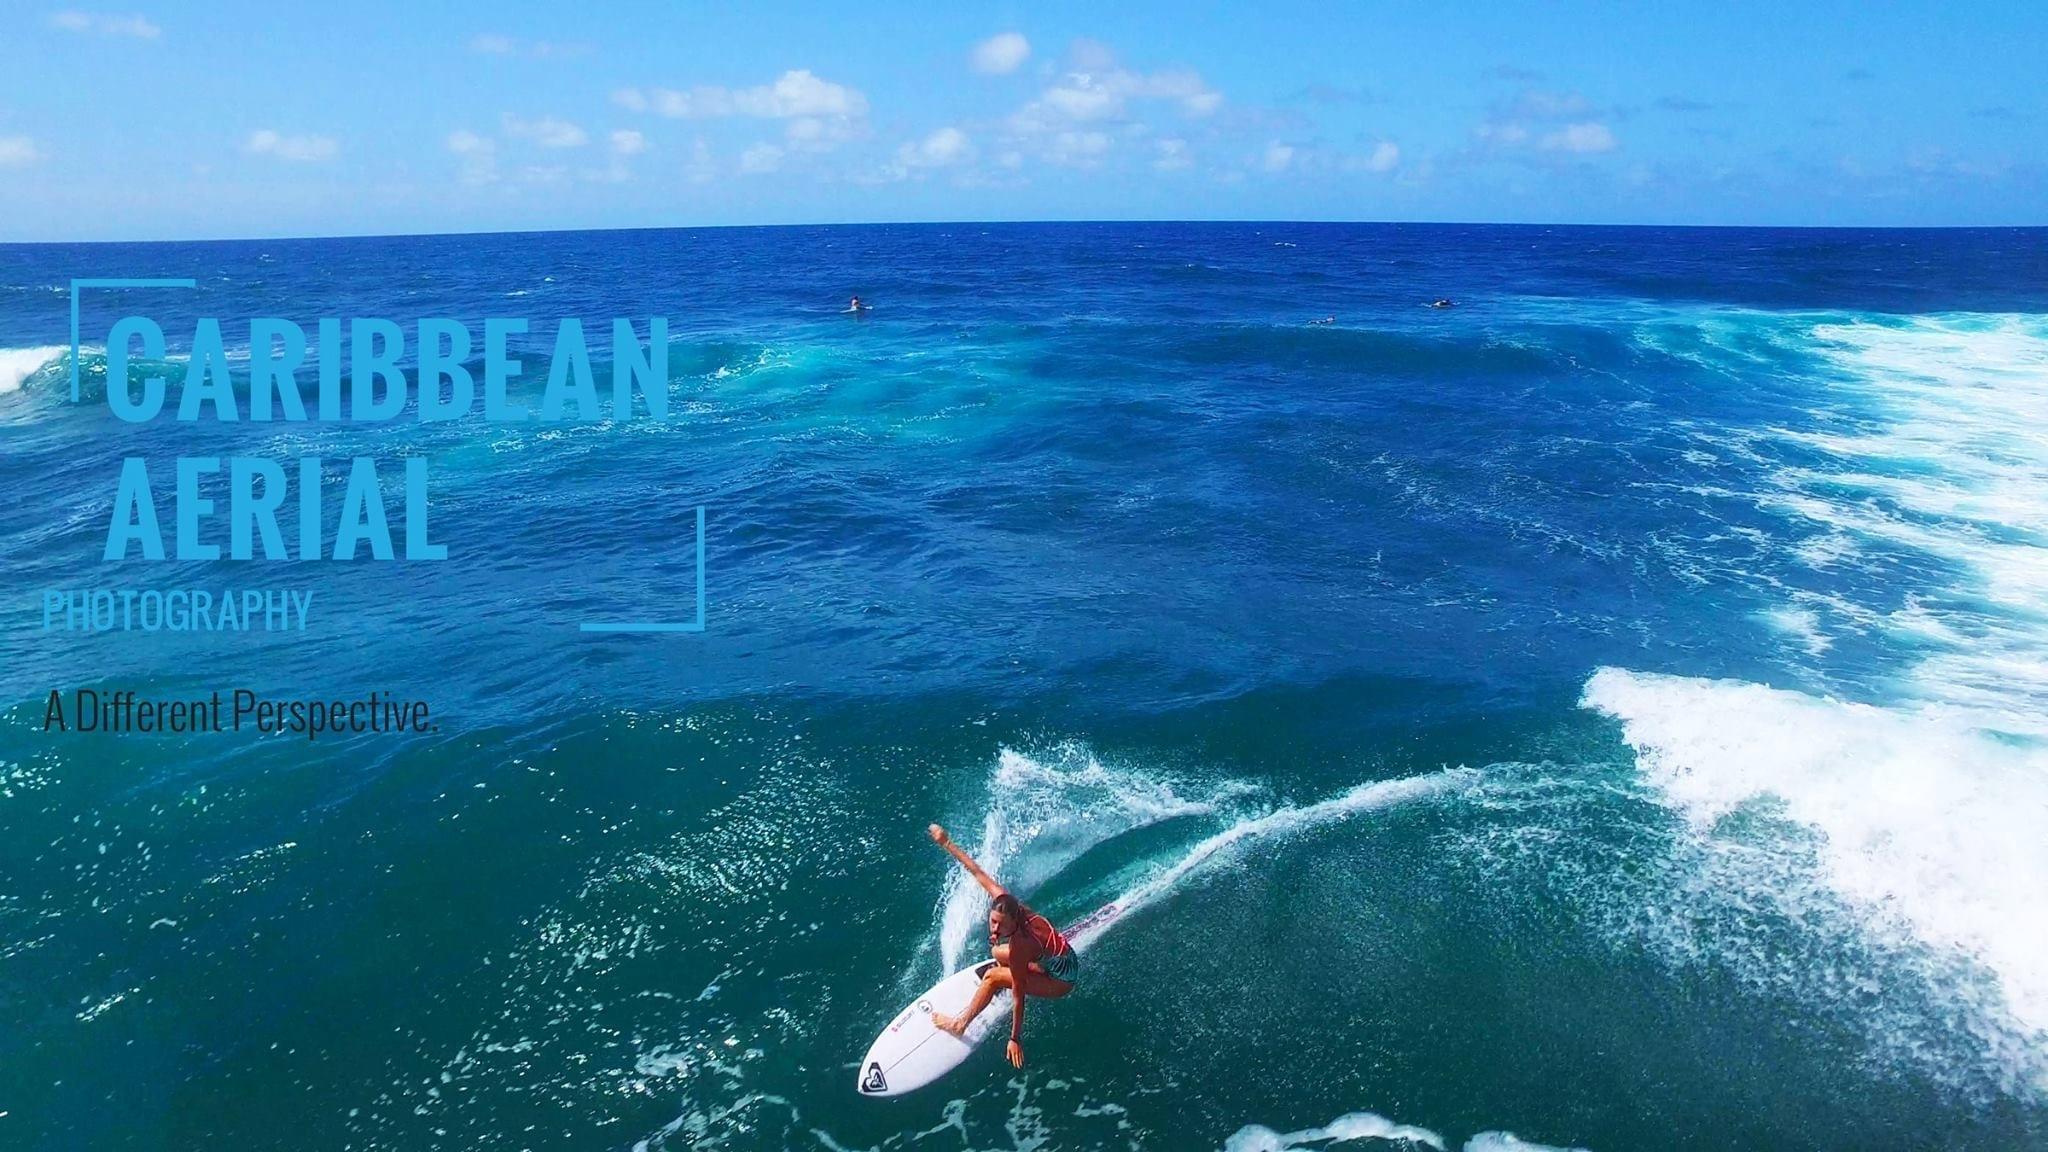 caribbean-aerial-photography-012